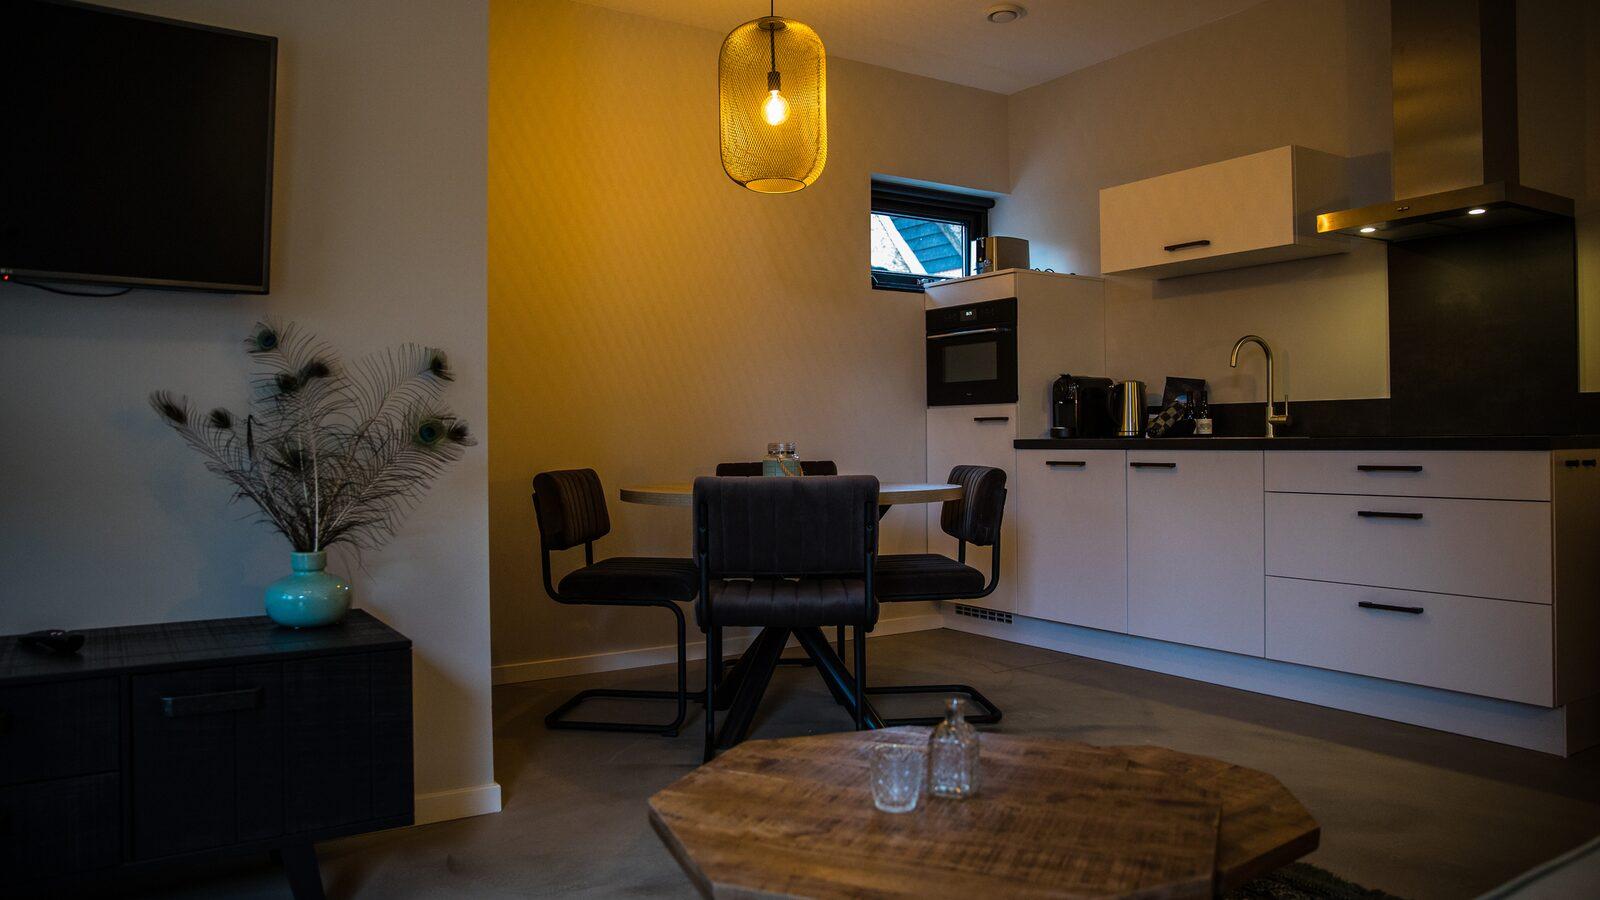 Appartement - Kon. Emmaweg 26 | Vrouwenpolder 'Uitspanning Oranjezon'